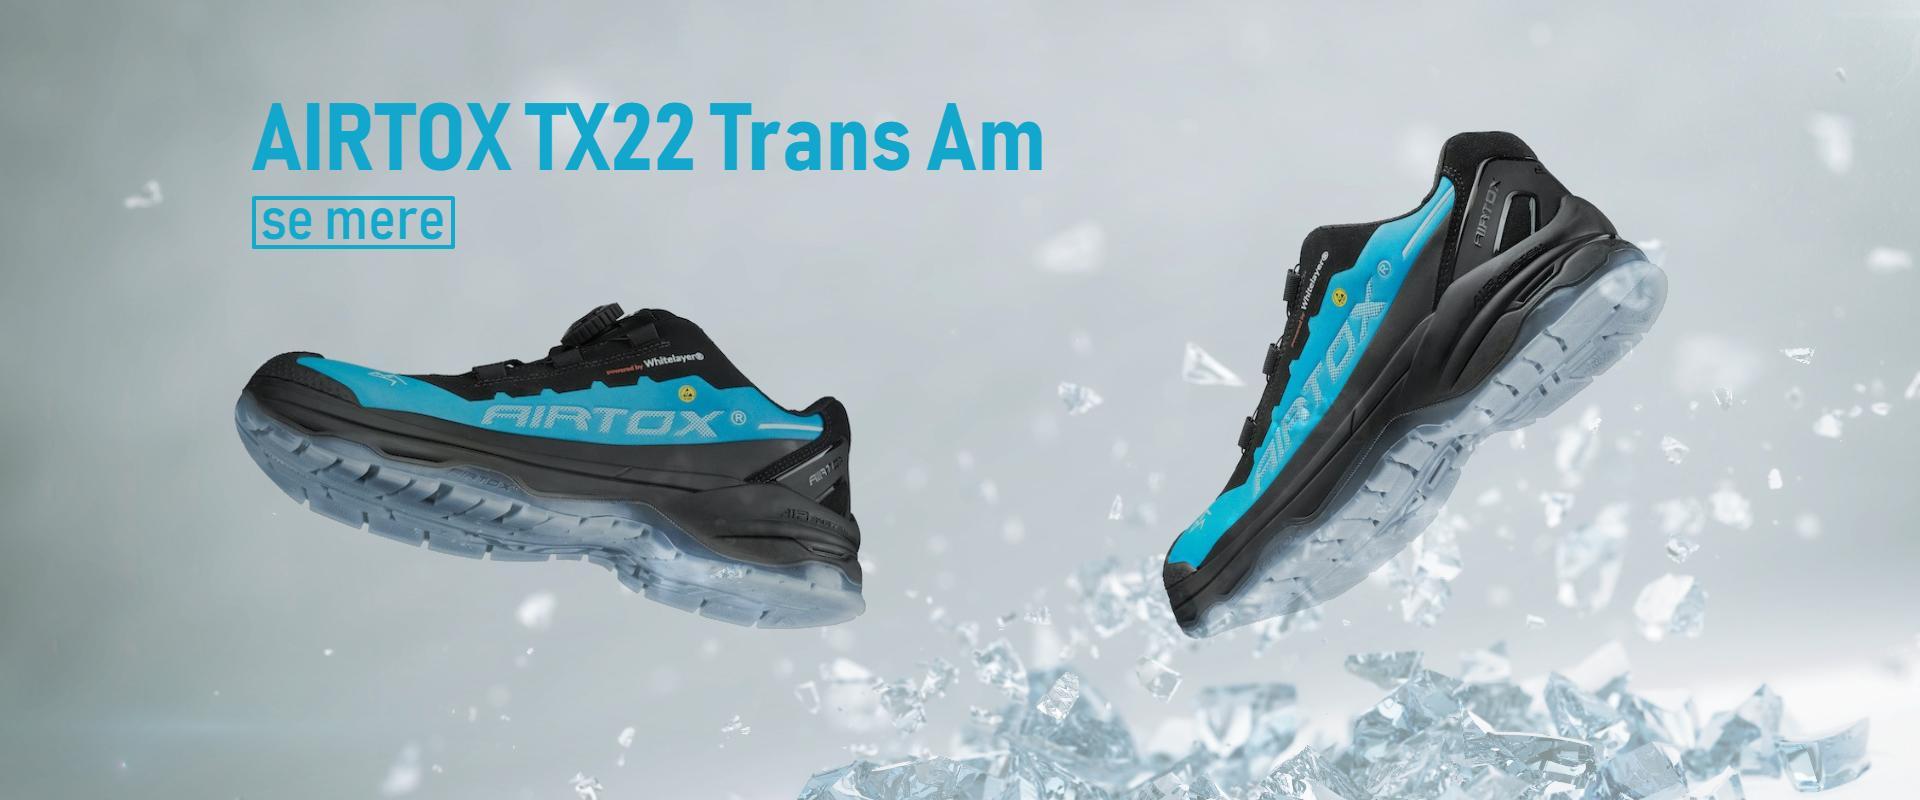 AIRTOX TX22 Trans Am sikkerhedssko